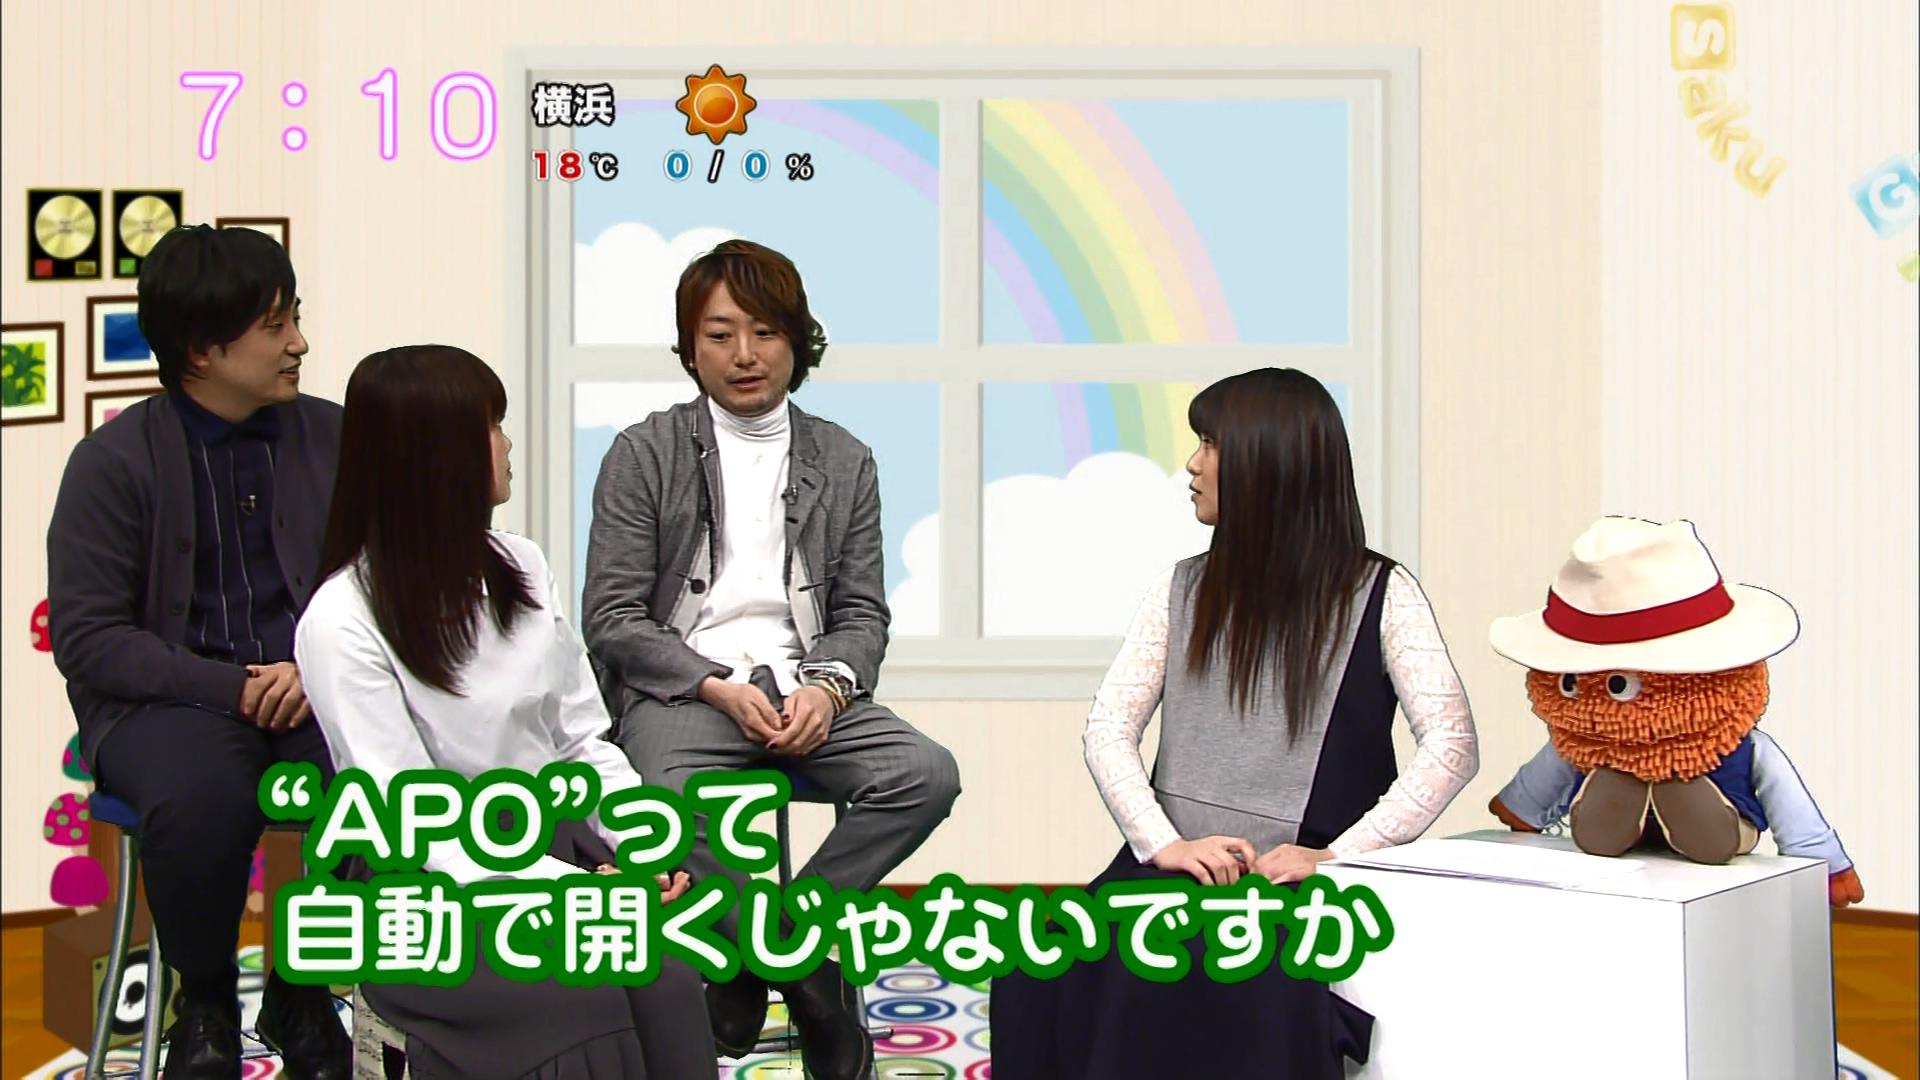 2016.03.17 いきものがかり(saku saku).ts_20160317_080847.276